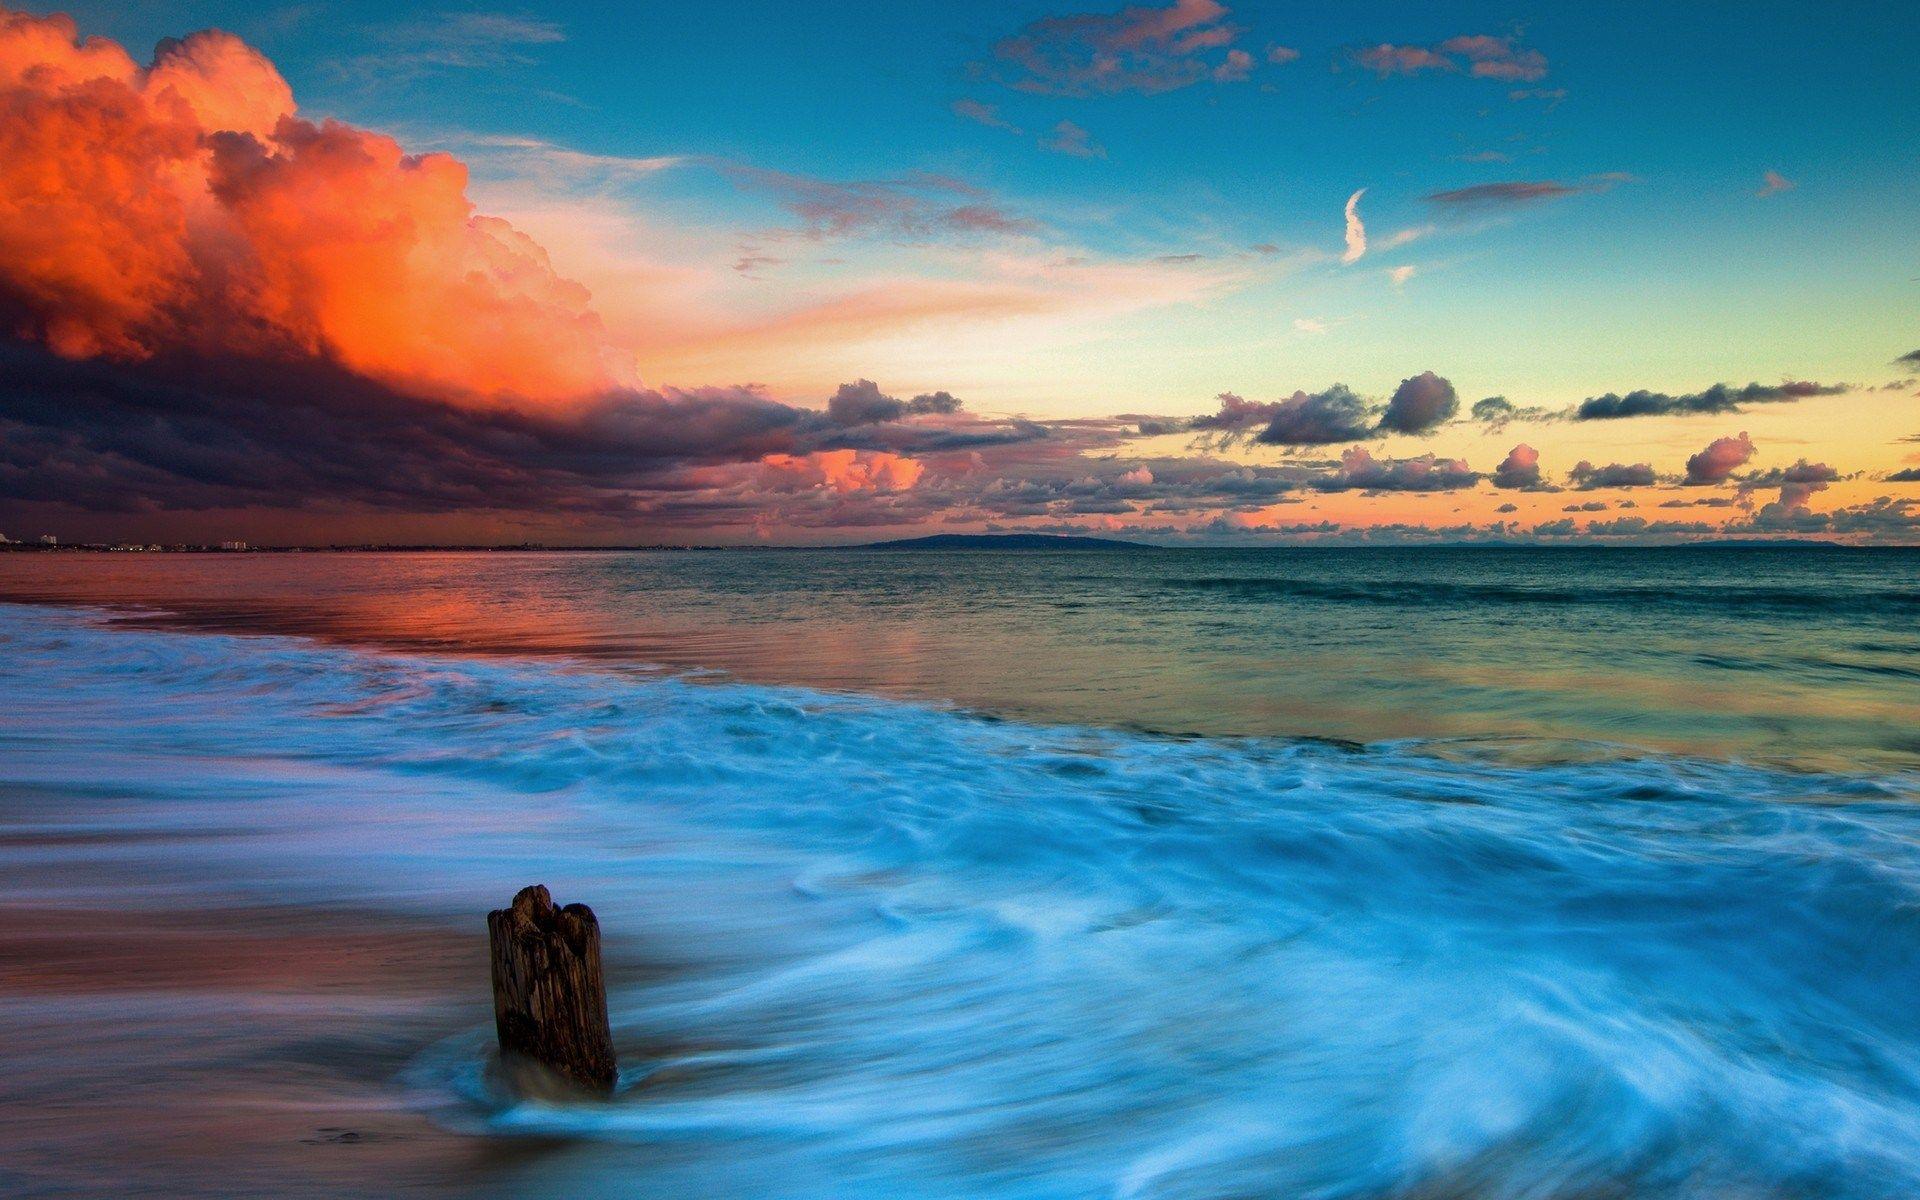 beach malibu california wallpapers hd o oshenka